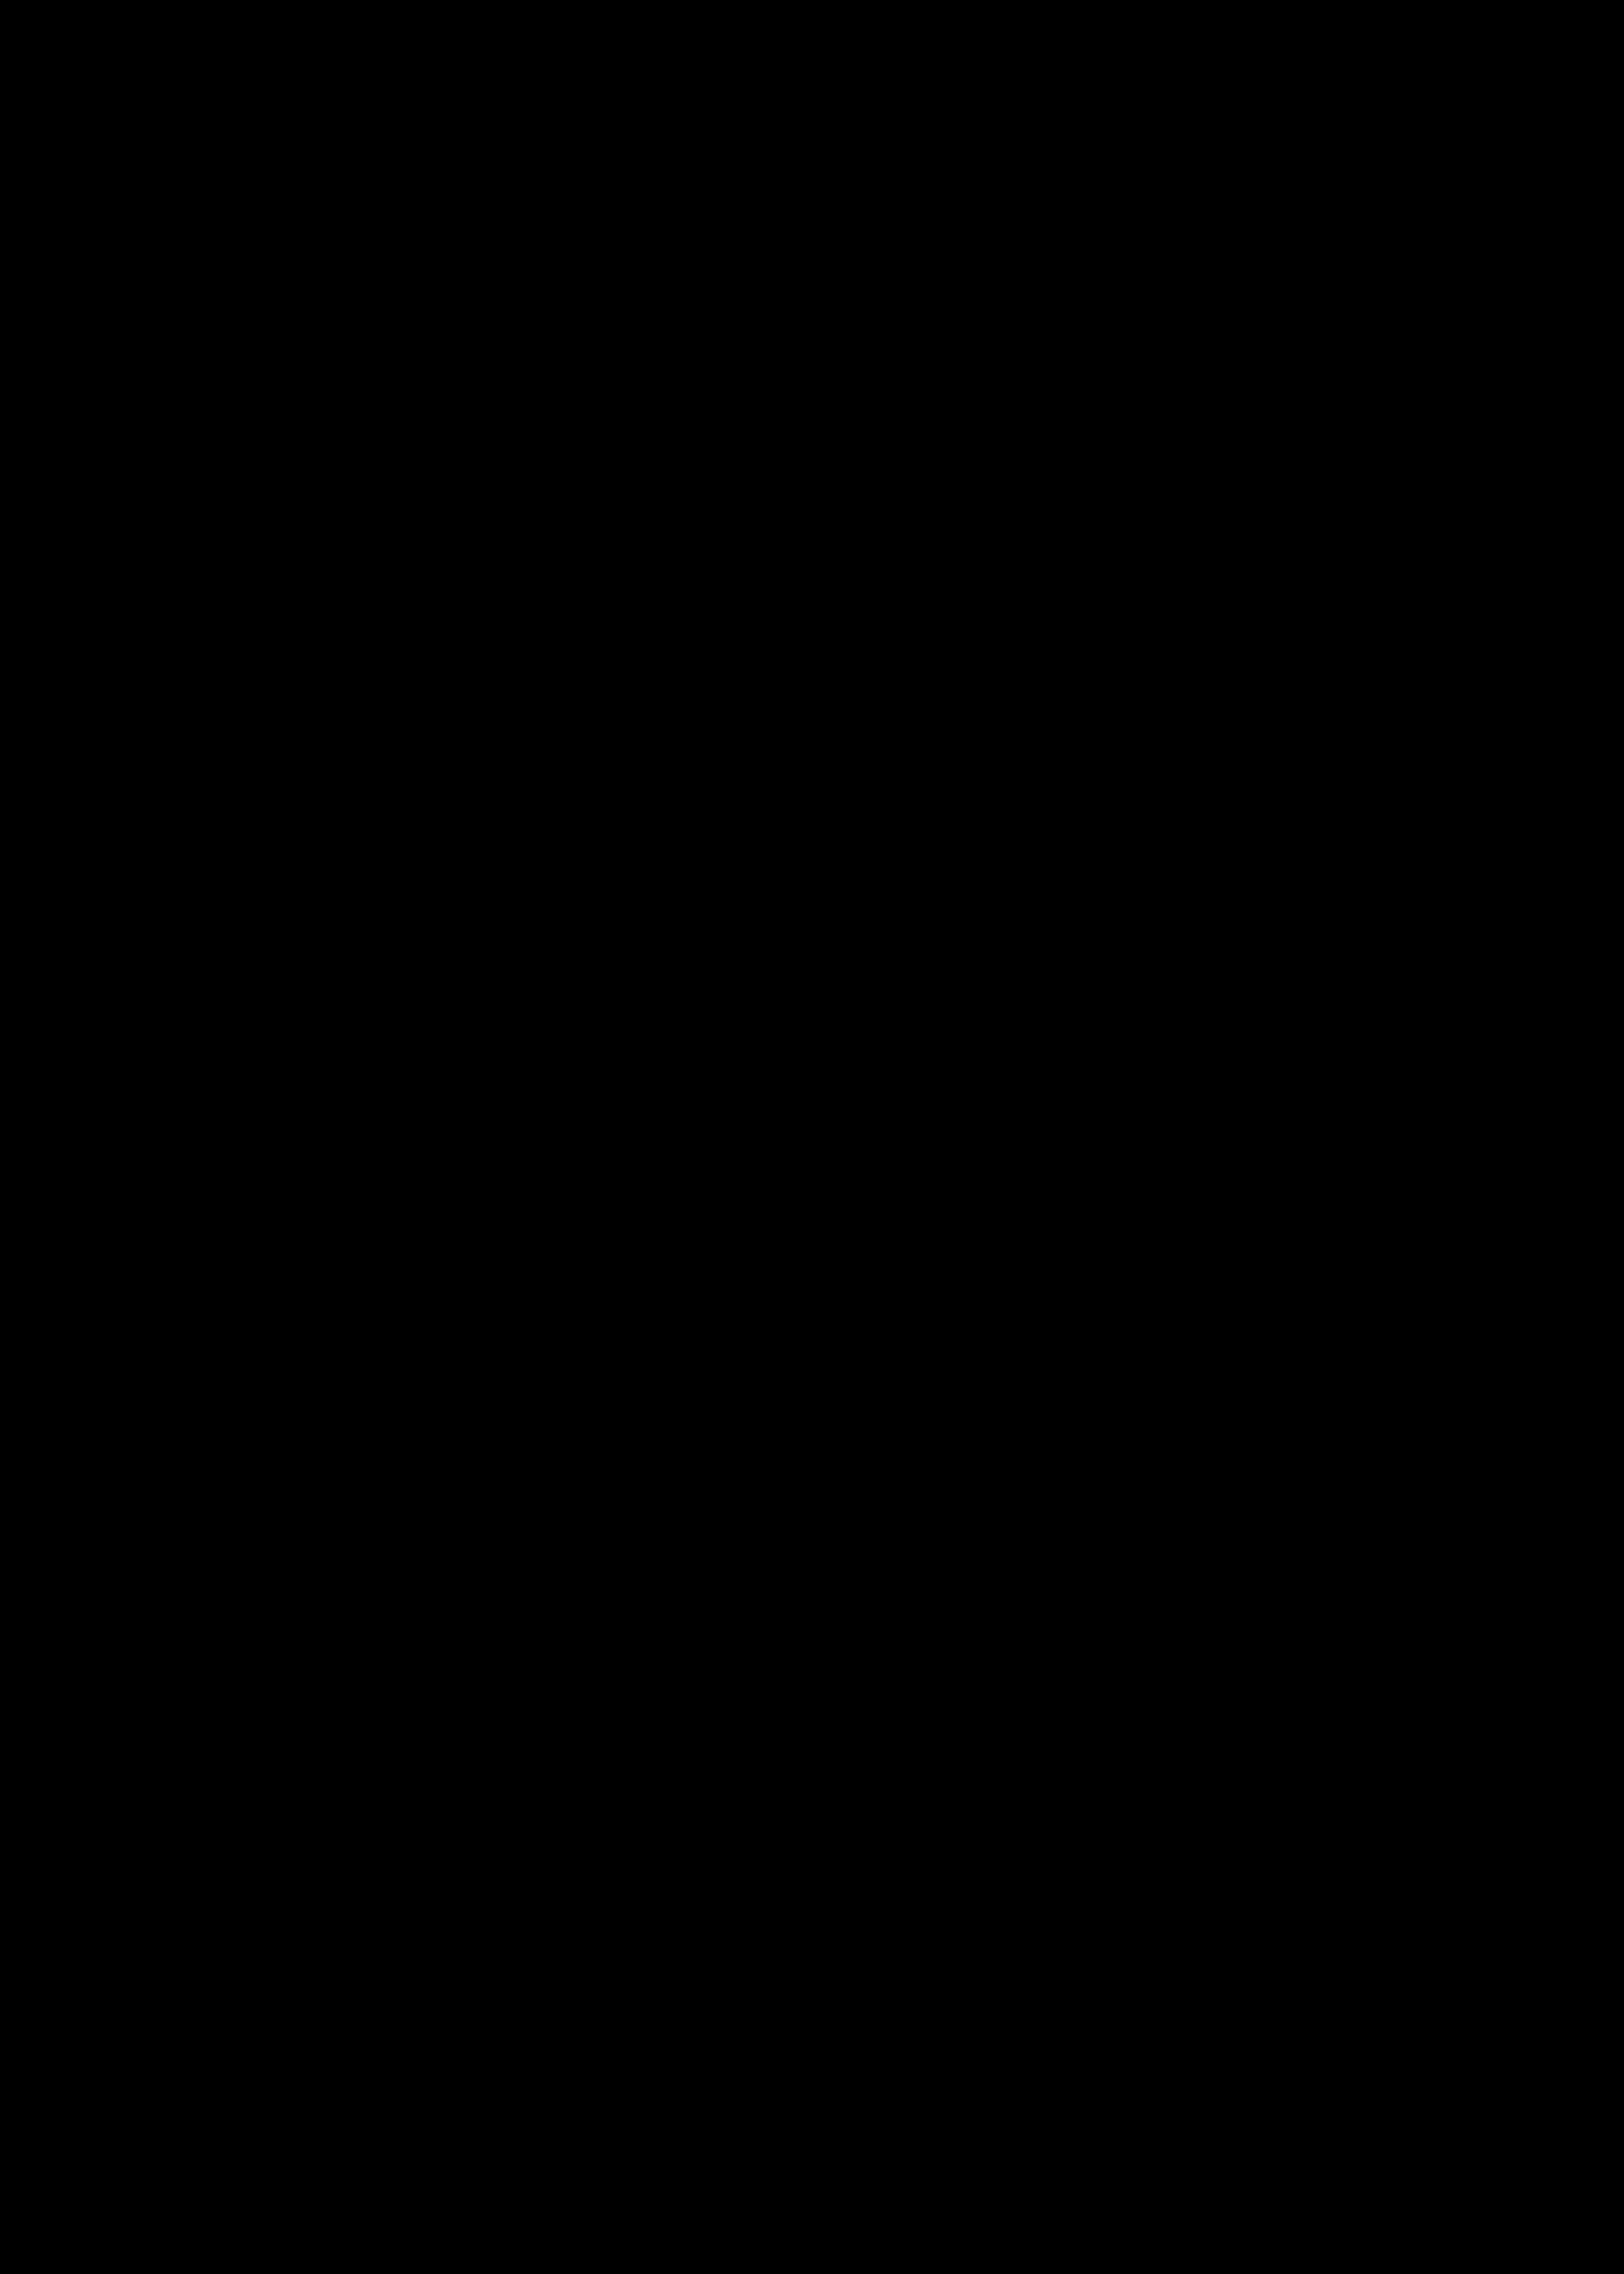 ceramicspeed CERAMICSPEED PF30A SHIM 24MM BLK, NC